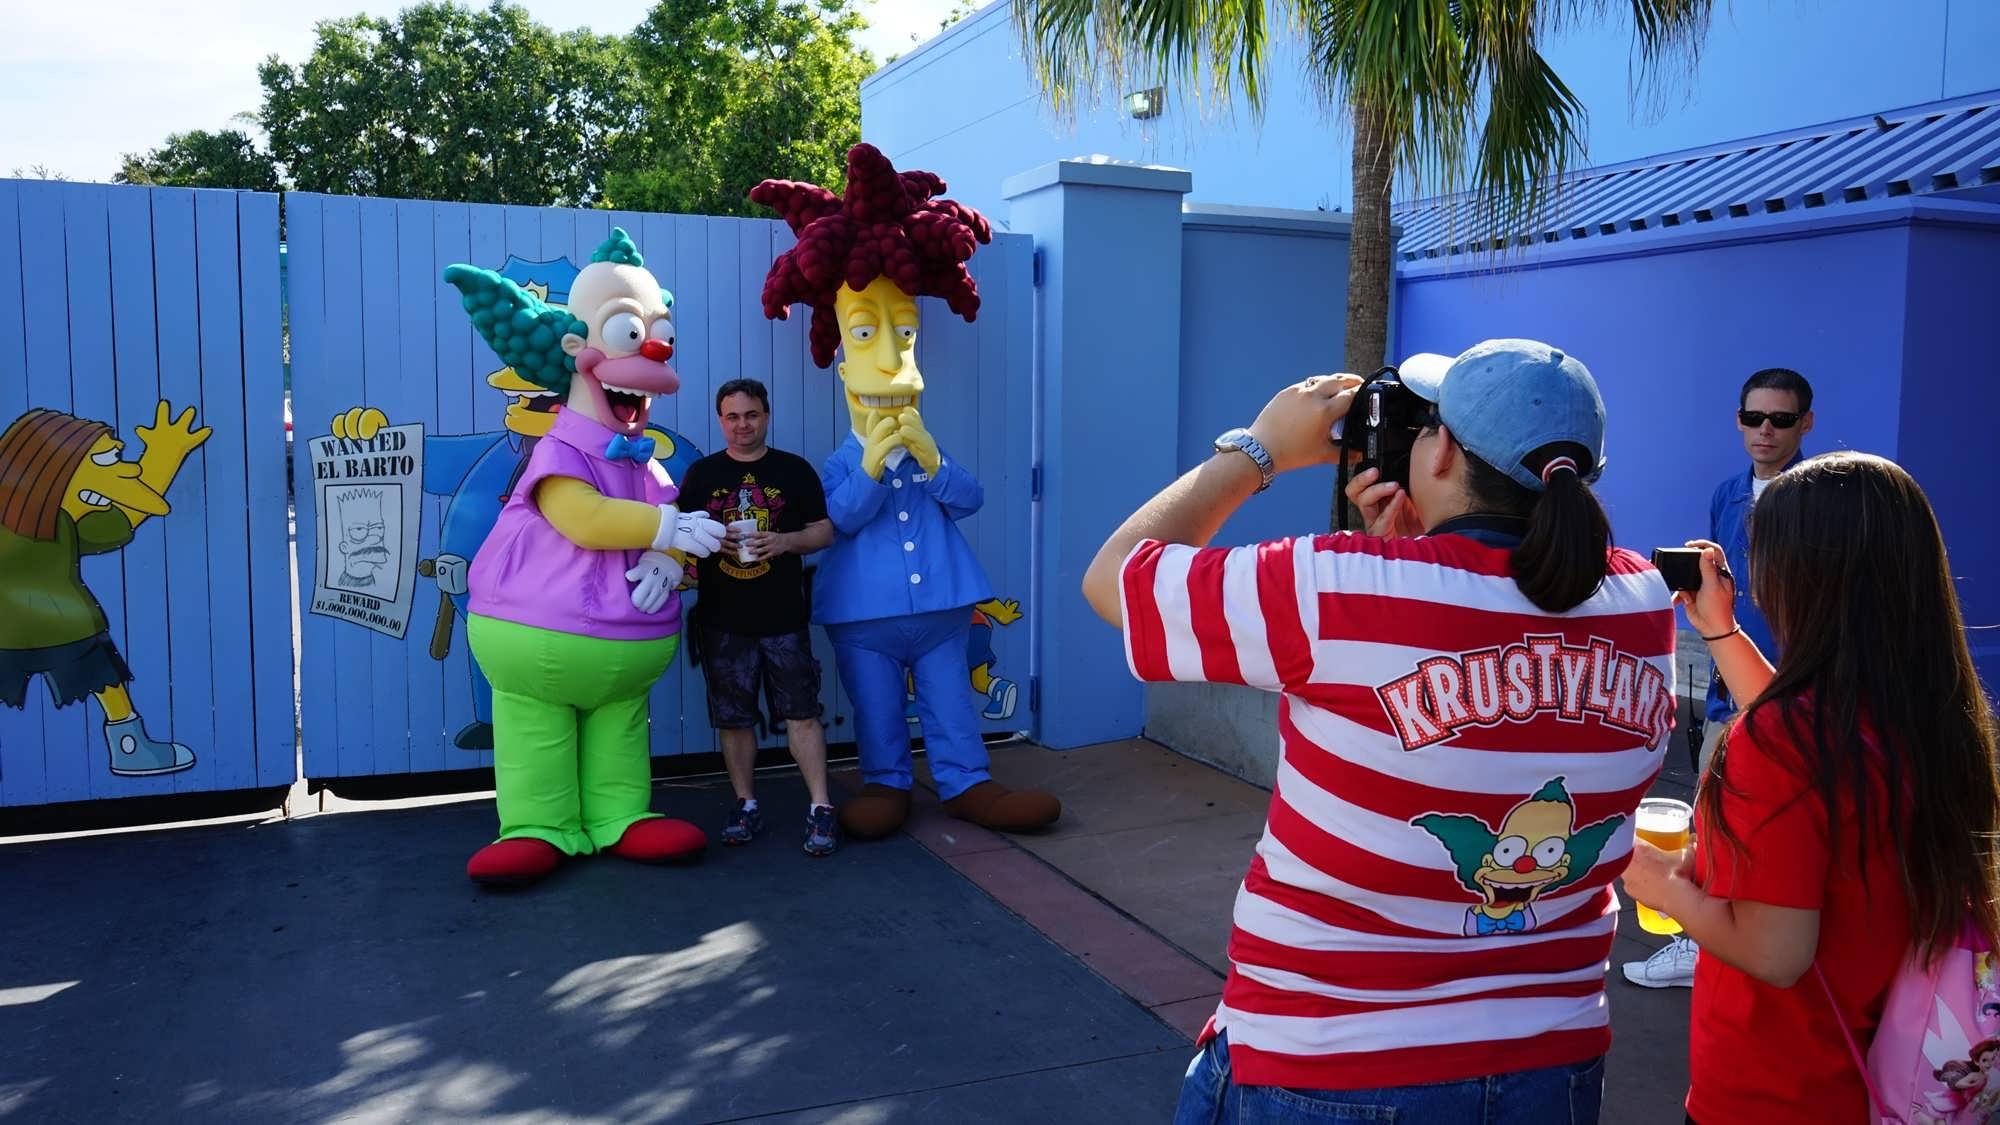 Krusty the Clown & Sideshow Bob near The Simpsons Ride